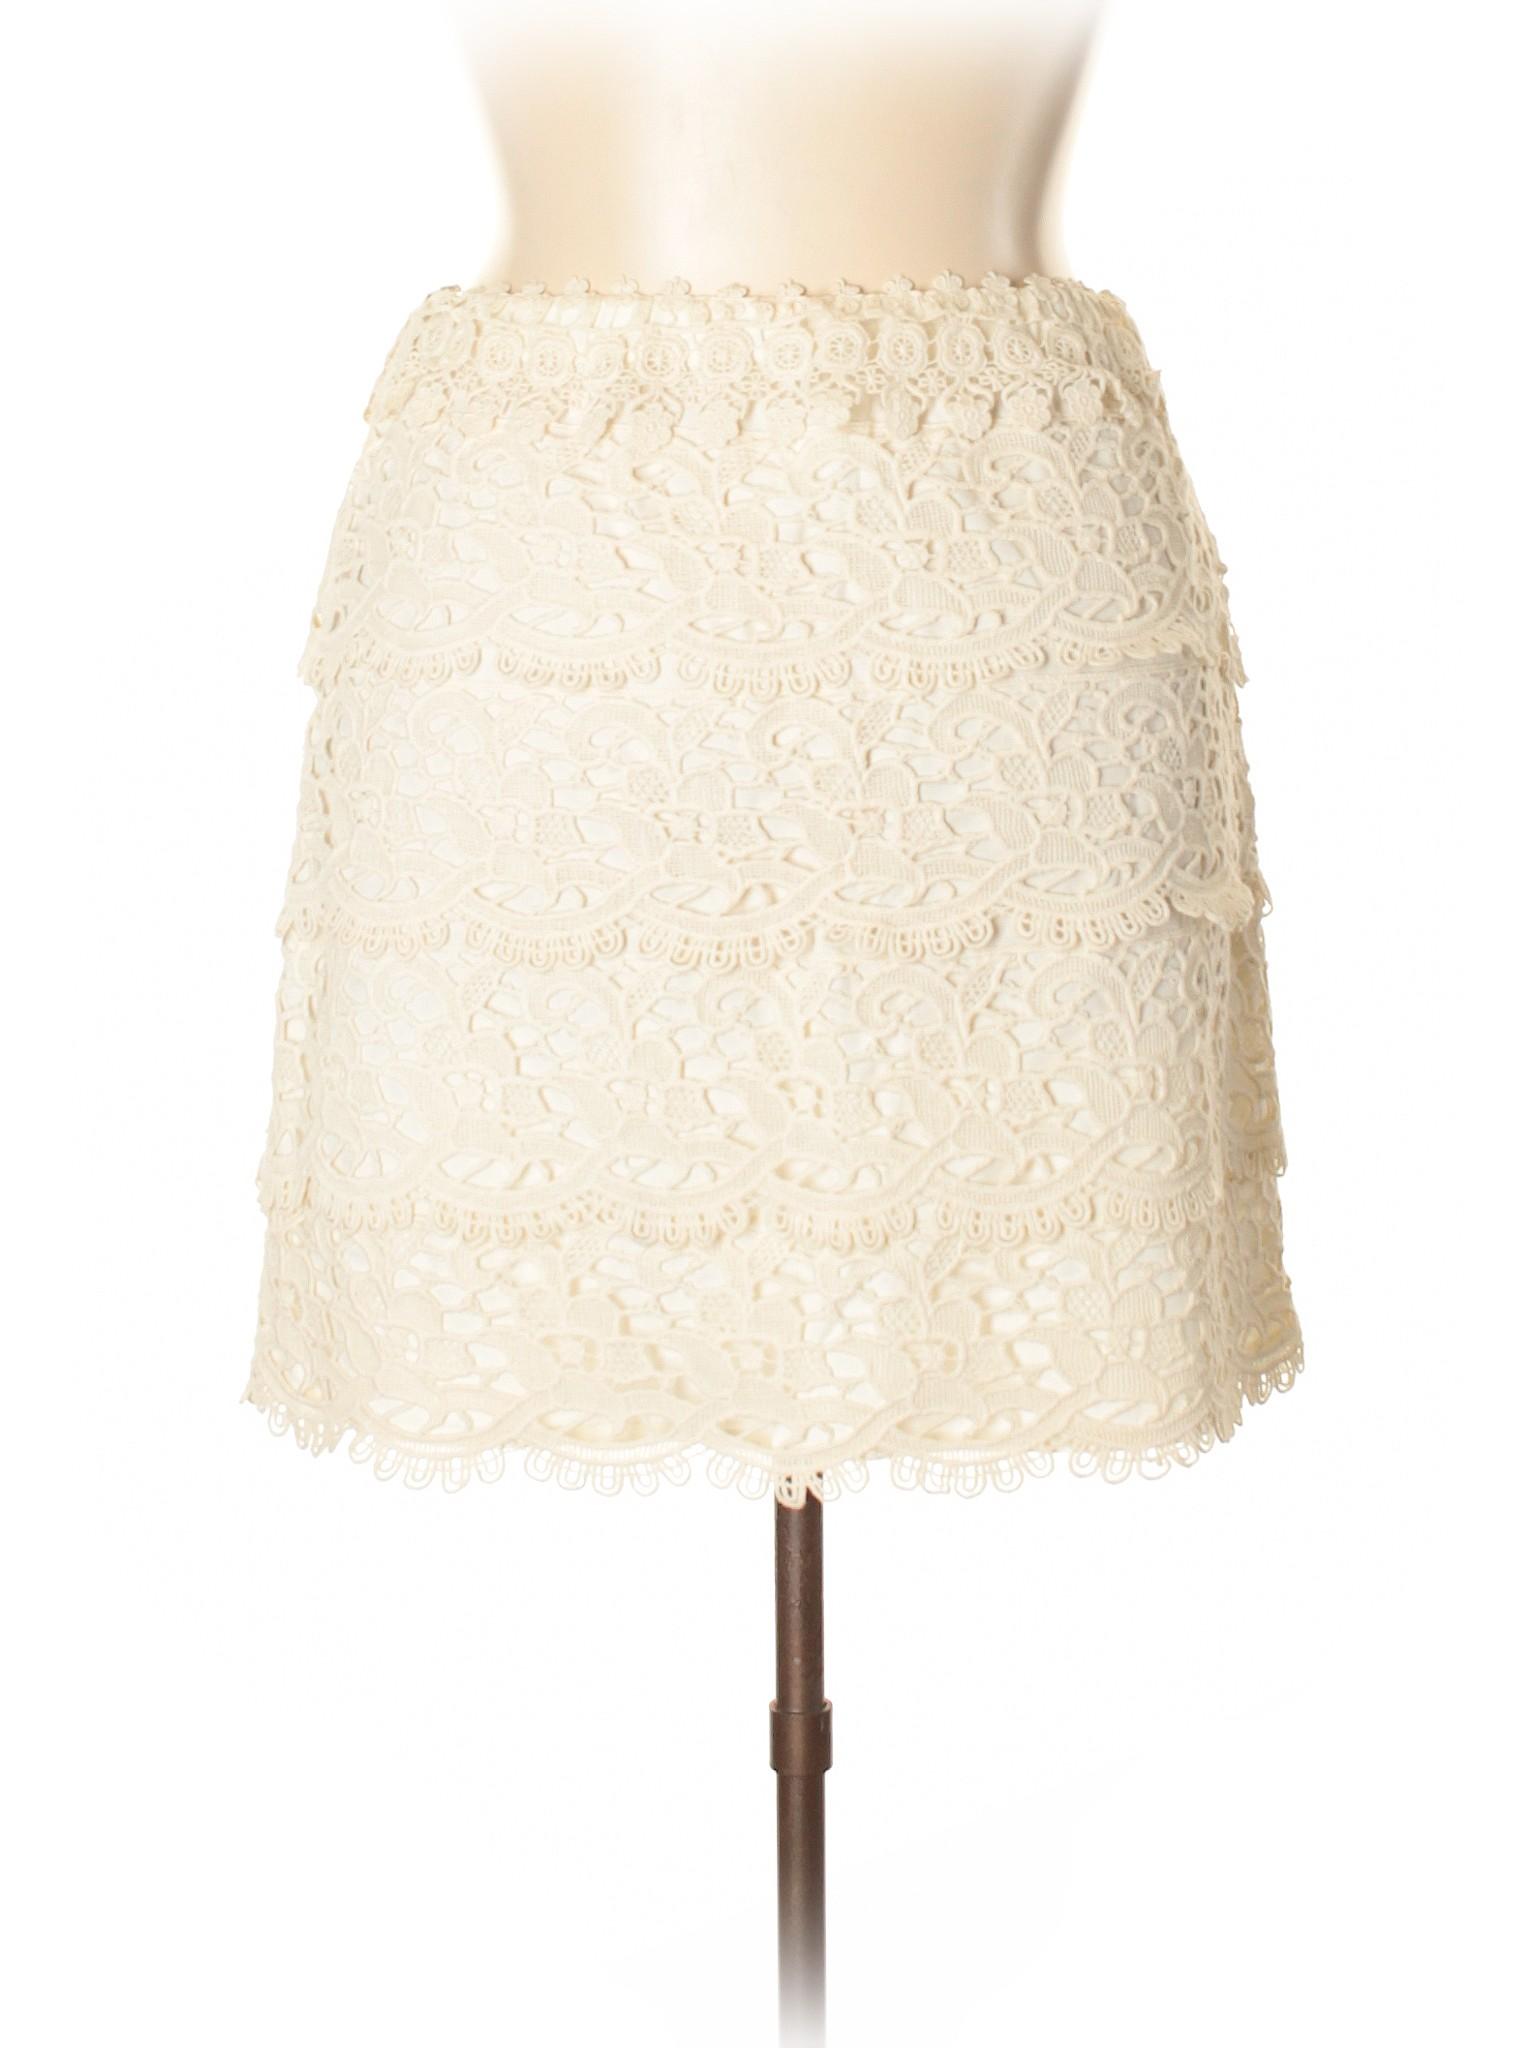 Skirt Skirt Skirt Boutique Boutique Boutique Casual Casual Casual Boutique xTy1pwq